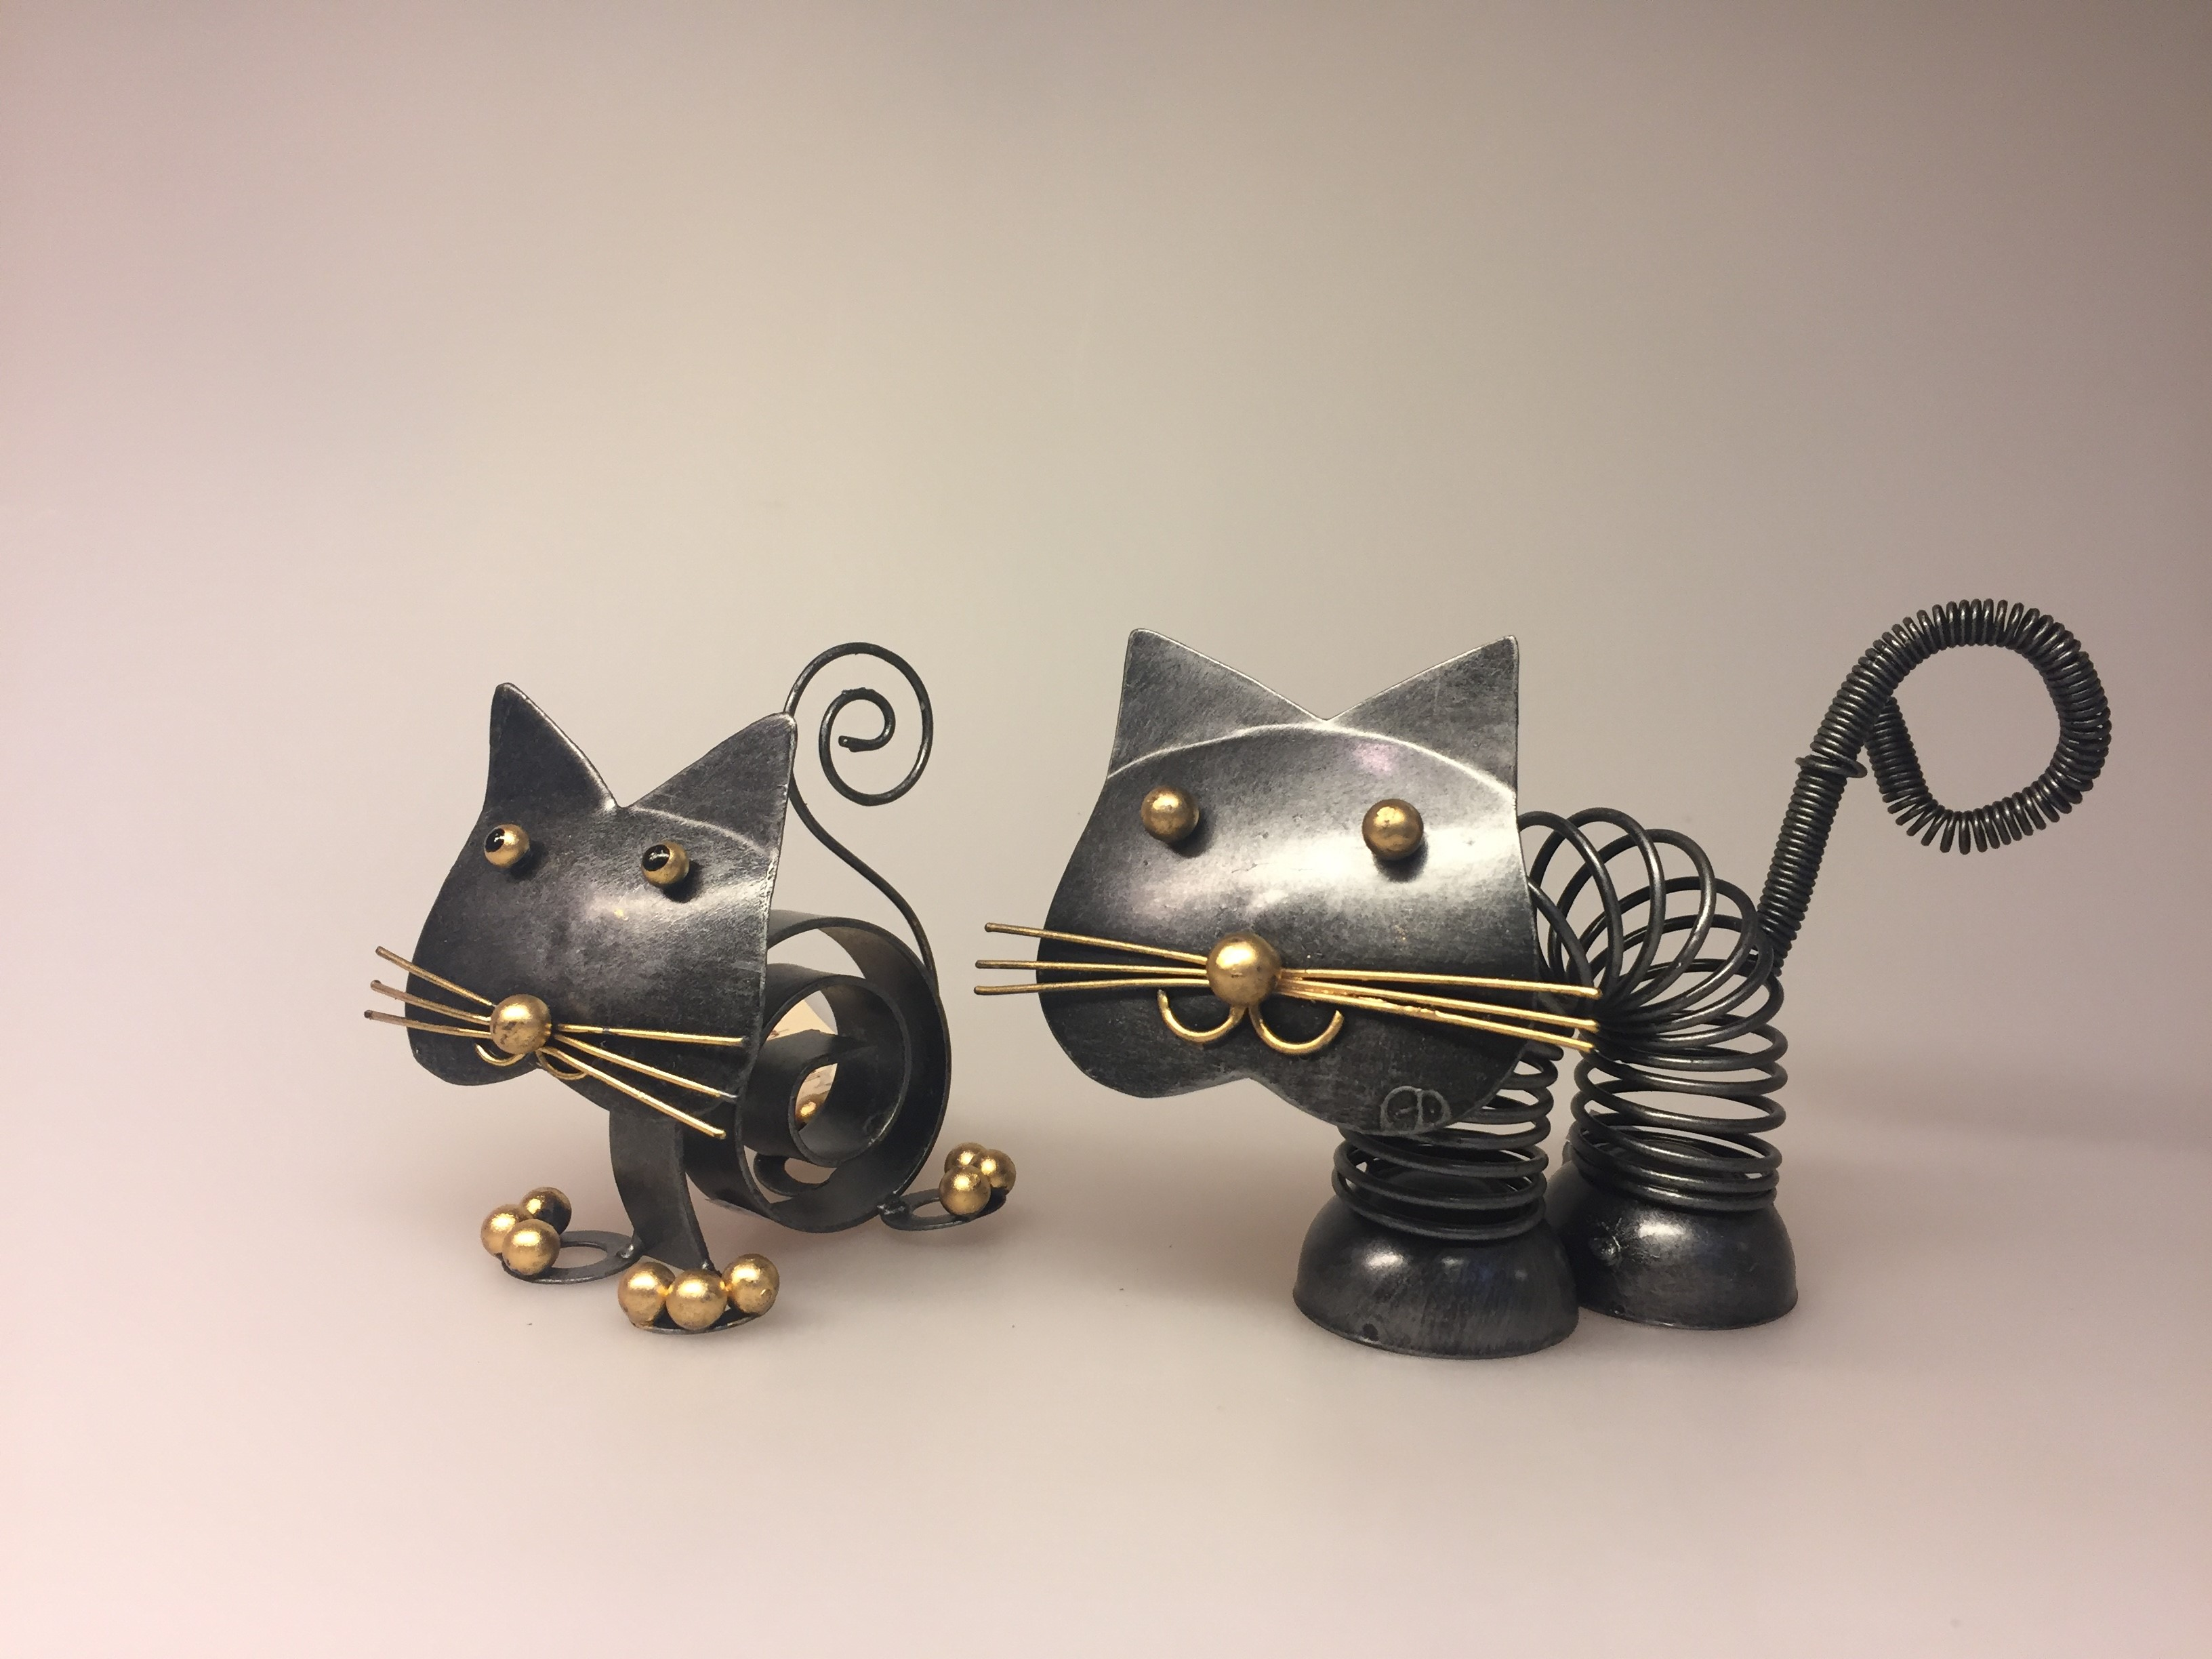 Metalfigur - Sort kat fjeder, metalkat, kattefigur, kat, missekat, mis, sort kat, penge, pengegave, penge i gave, memo, noter, ting med katte, katteting, biti, ribe. Metalfigur - Sort kat spiral, metalkat, kattefigur, kat, missekat, mis, sort kat, penge, pengegave, penge i gave, memo, noter, ting med katte, katteting, biti, ribe